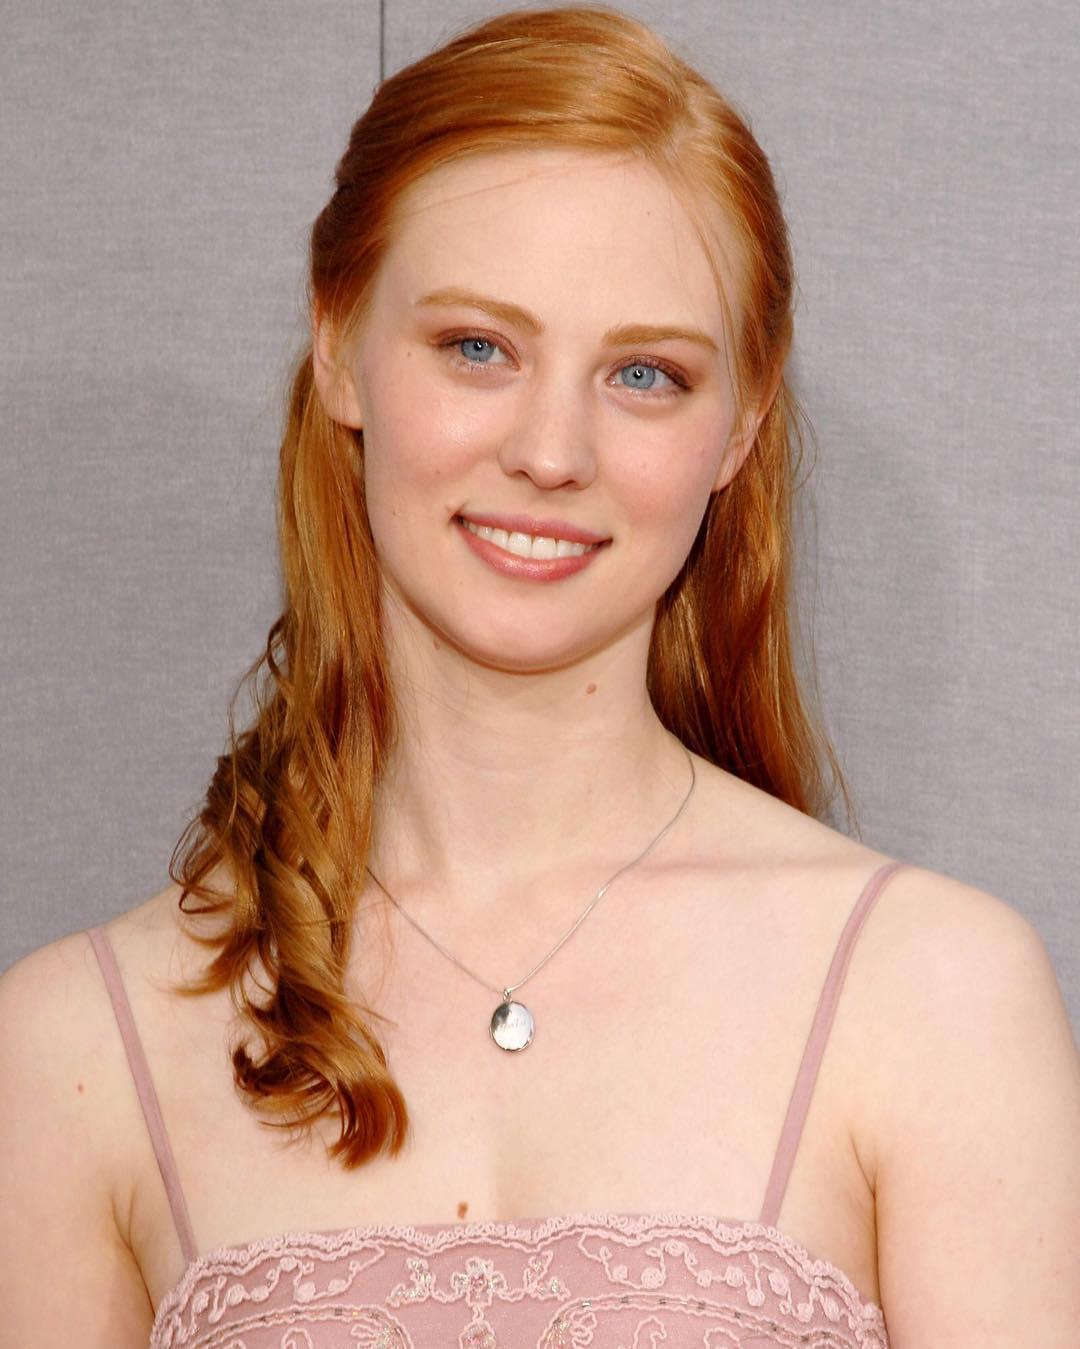 Deborah Ann Woll Photos - HD Actress Photo